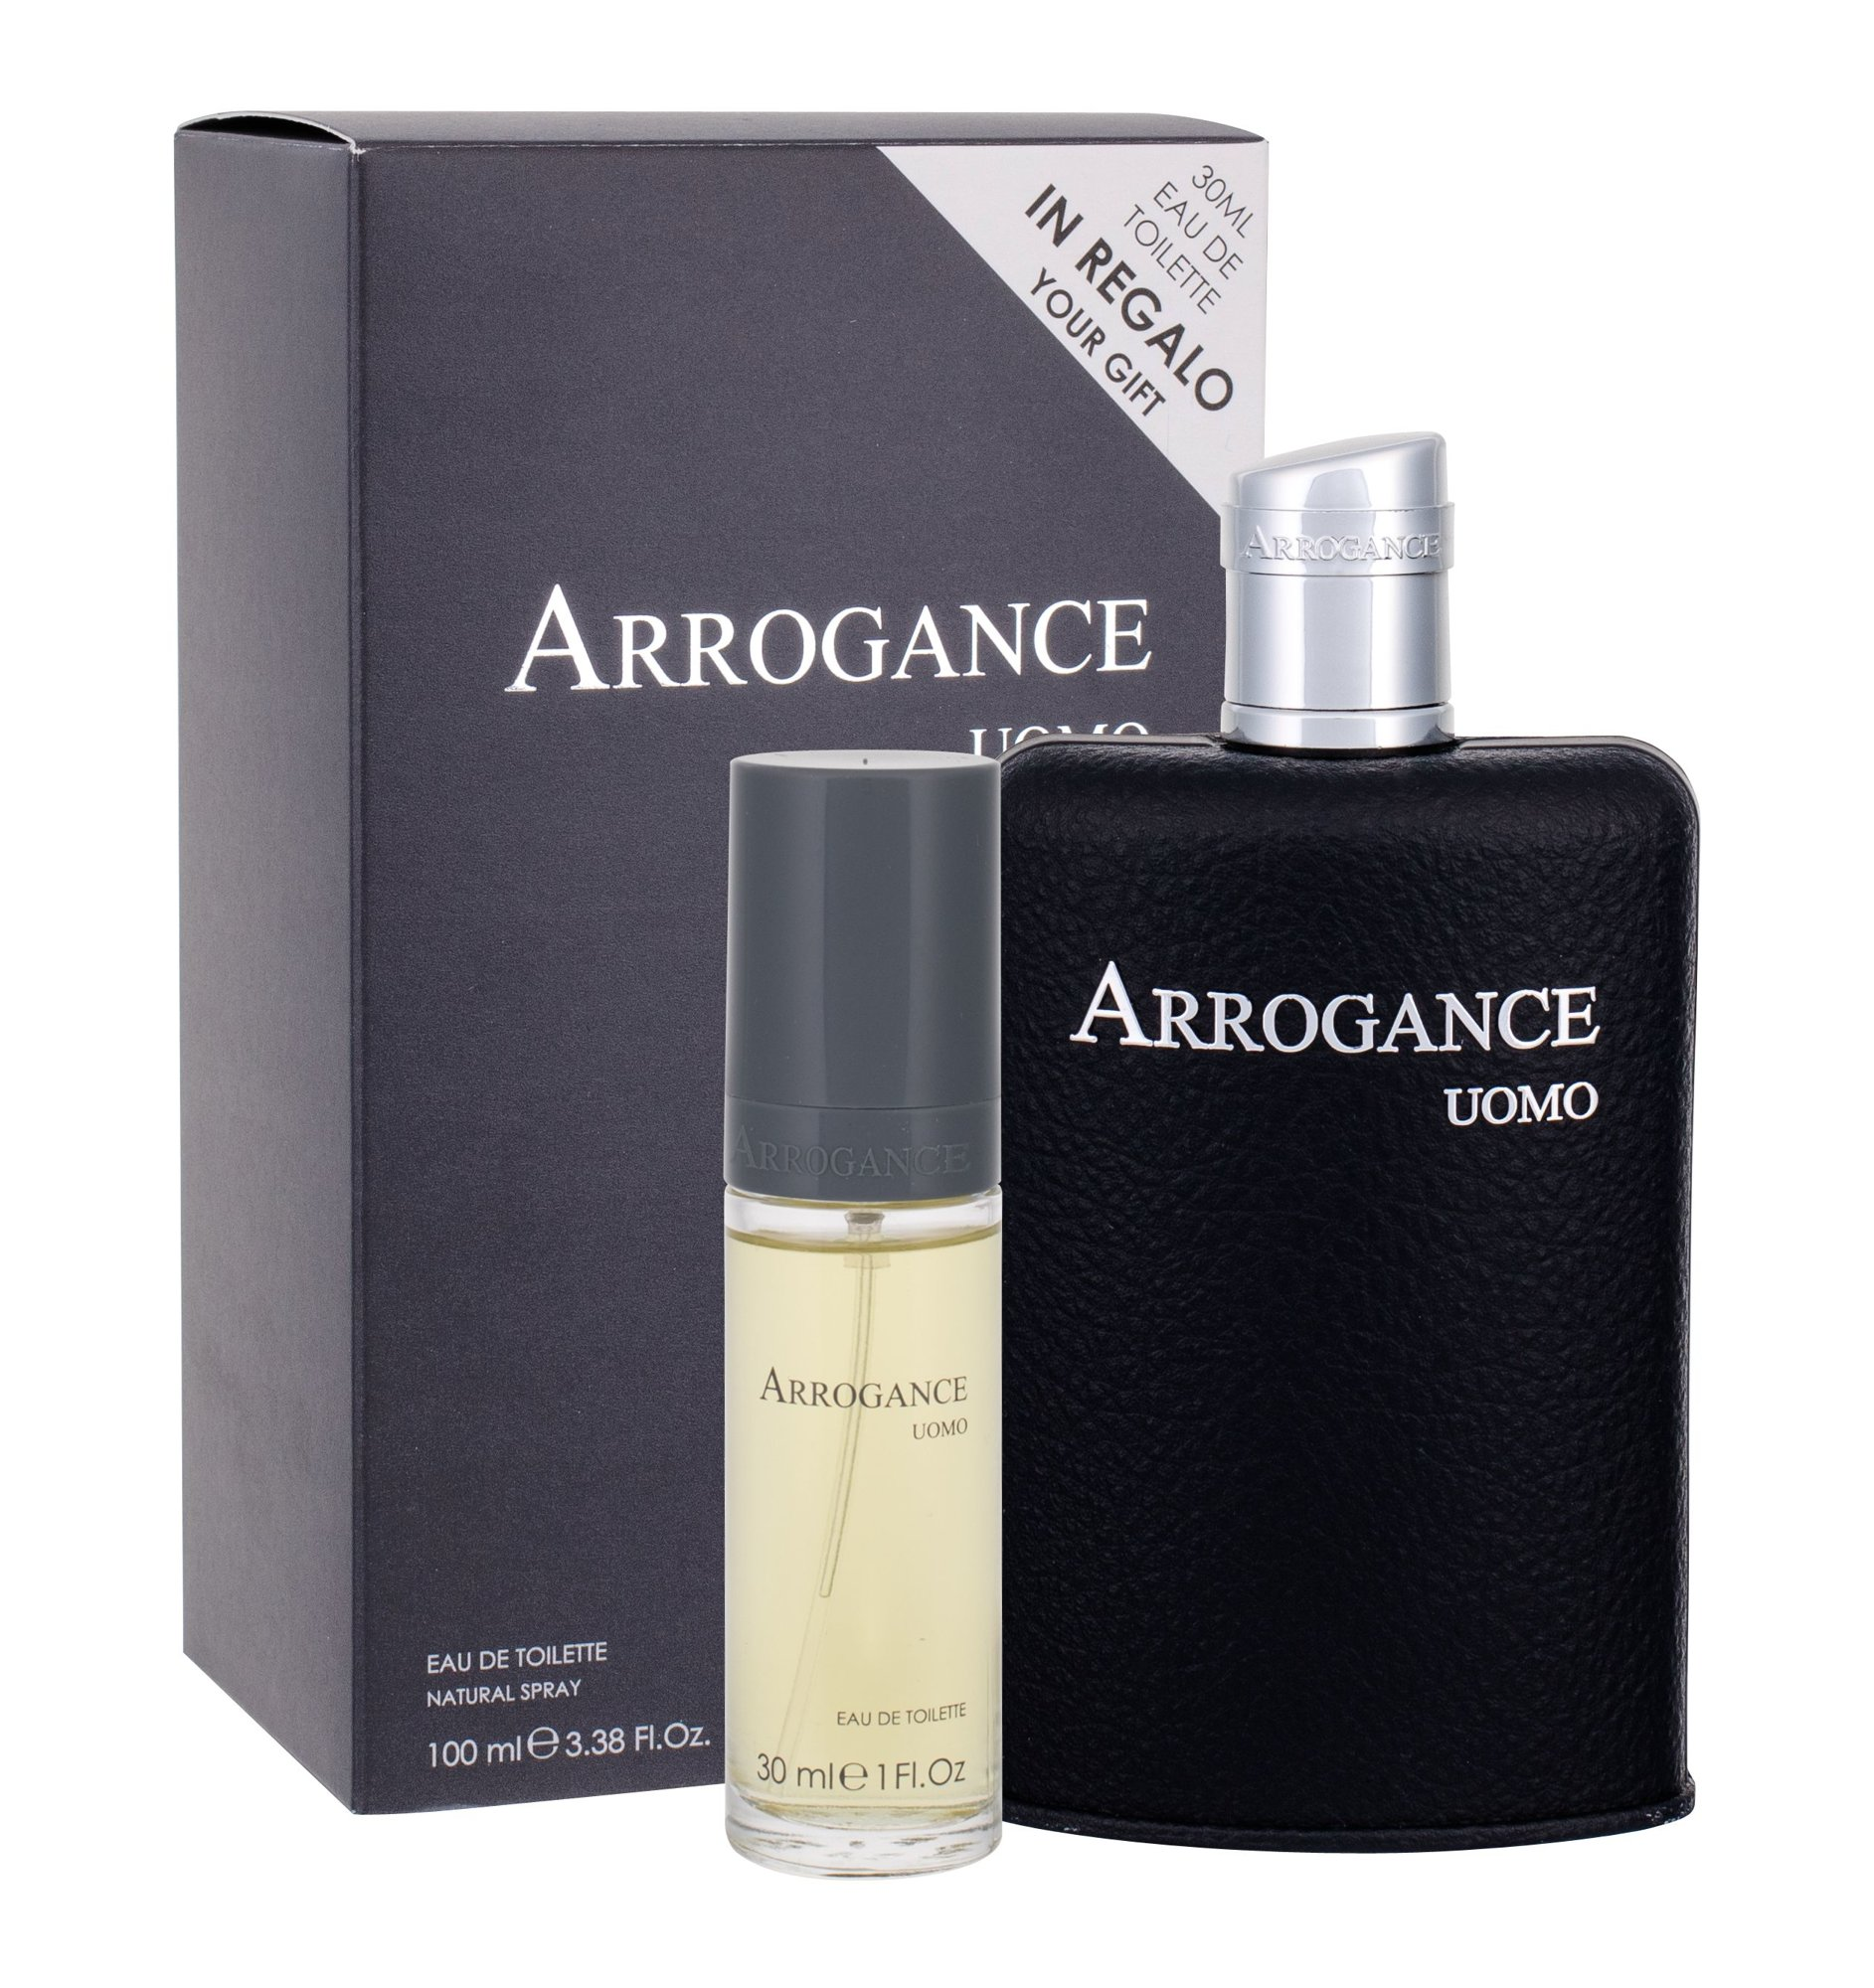 Arrogance Arrogance Uomo EDT 100ml